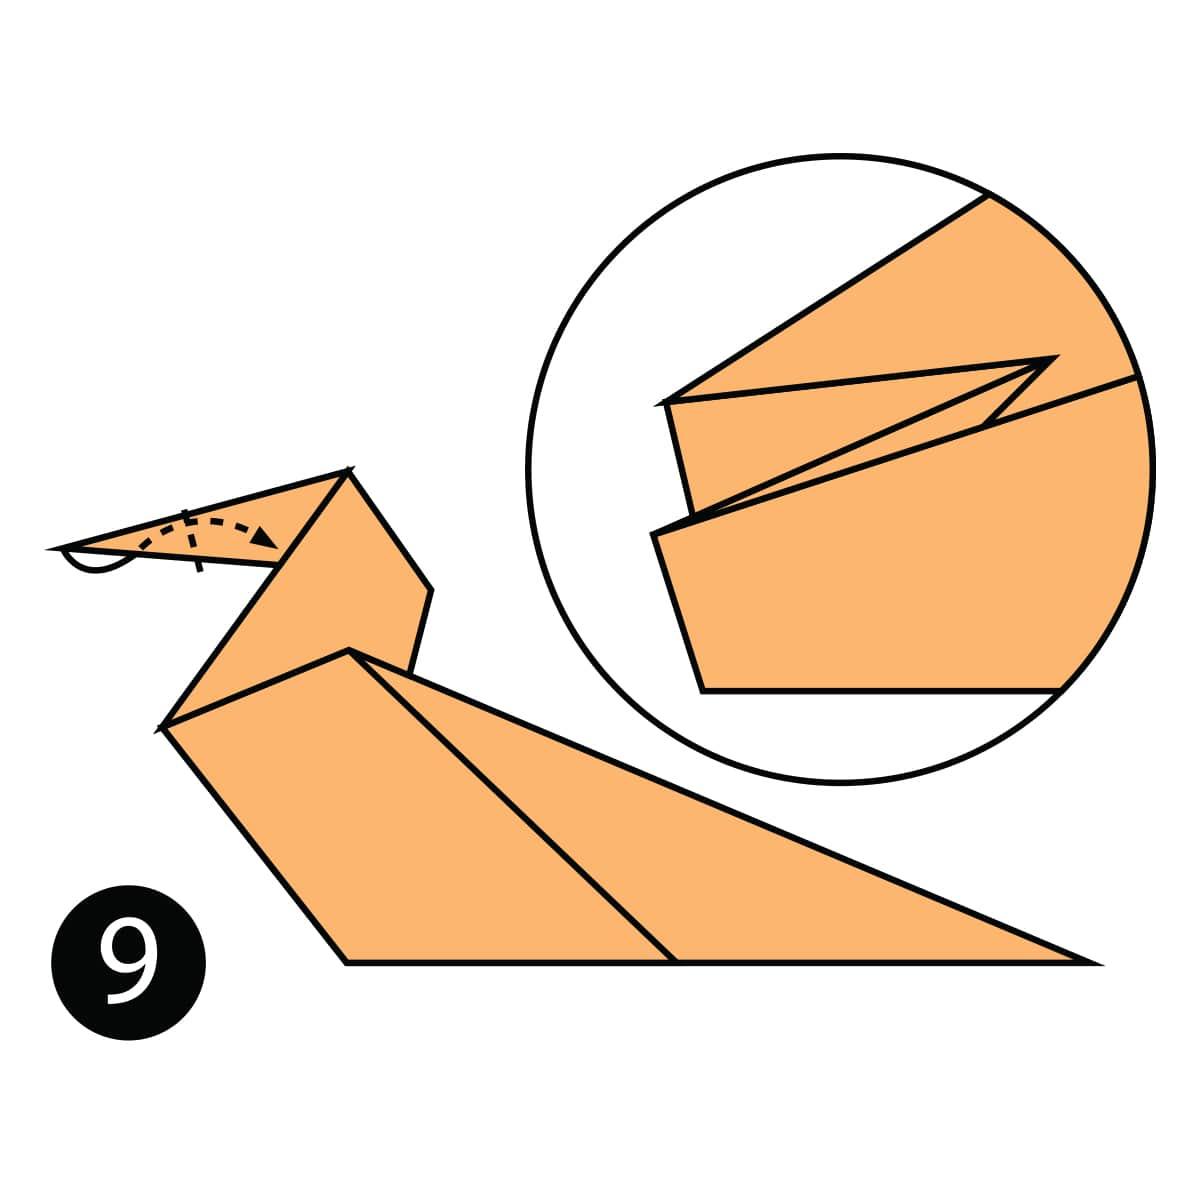 Horse Step 9